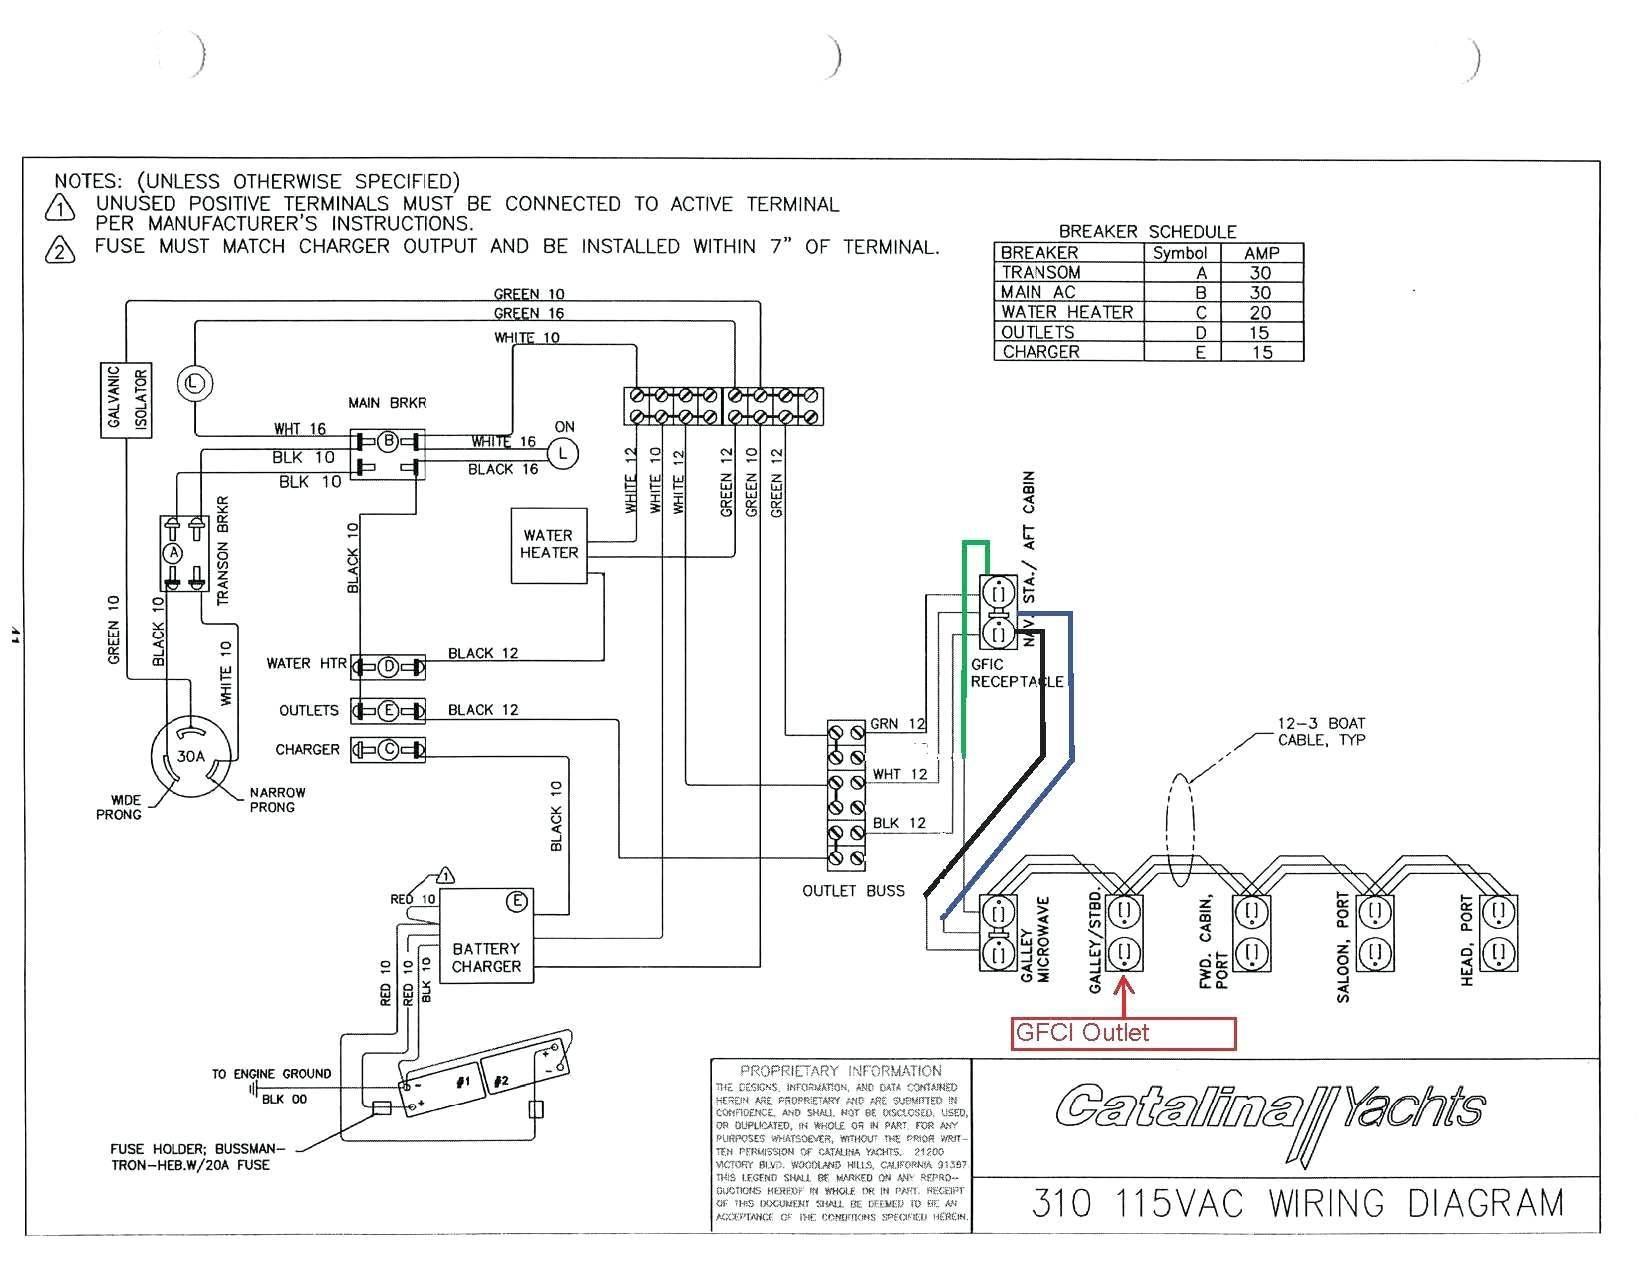 J Boat Wiring Diagram - Wiring Diagram K8 Kenner Boat Wiring Diagram on